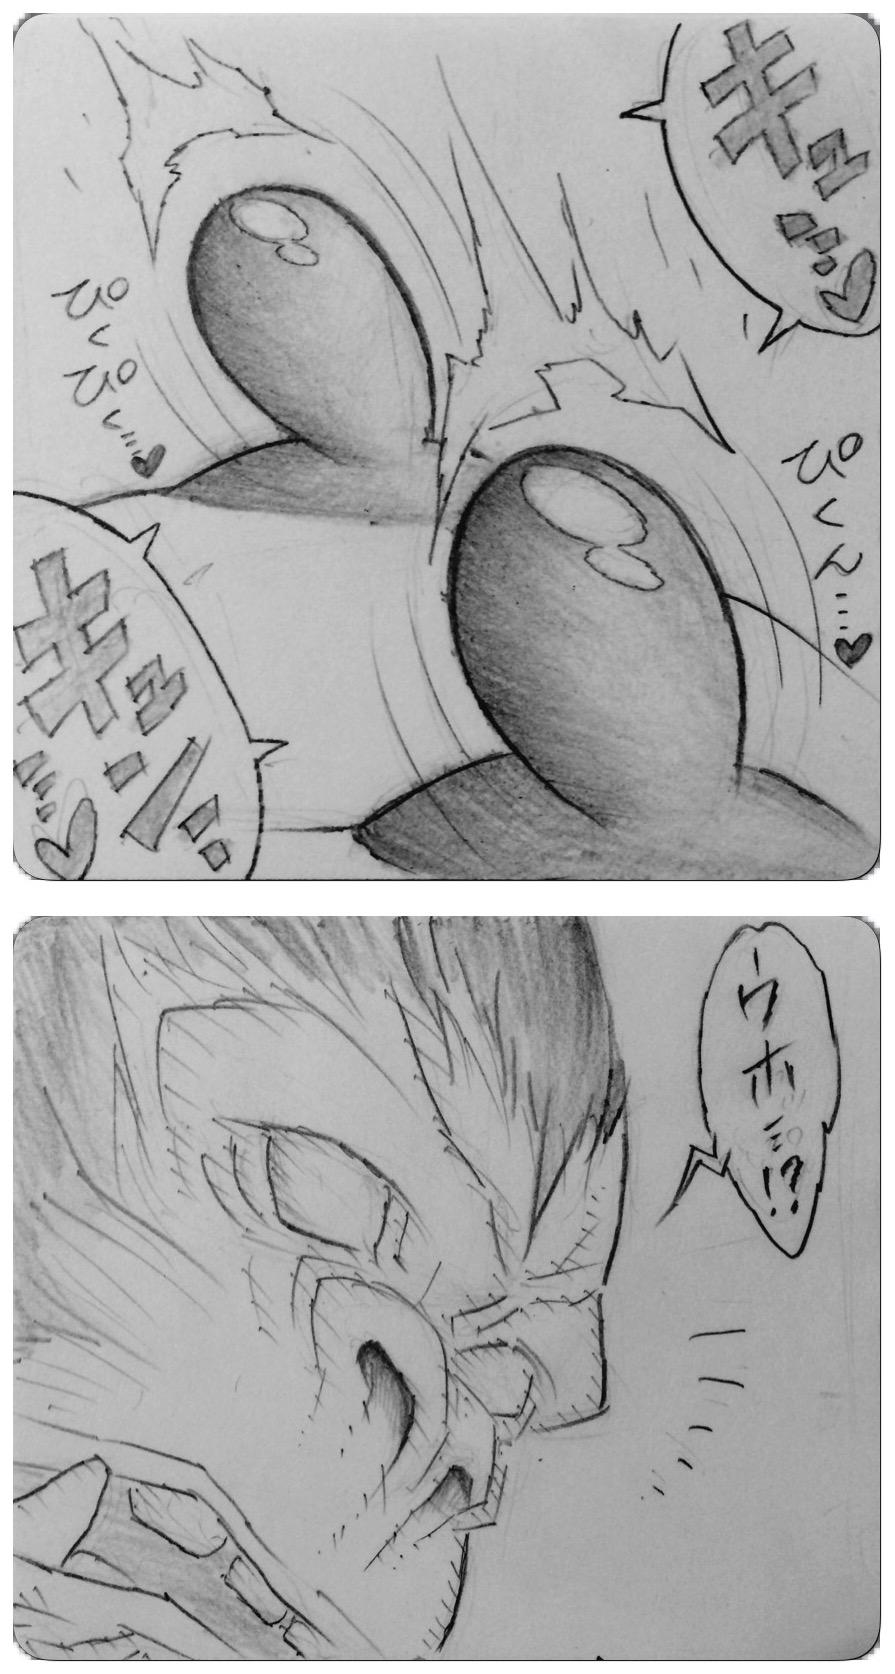 Gorilla-san and... 35